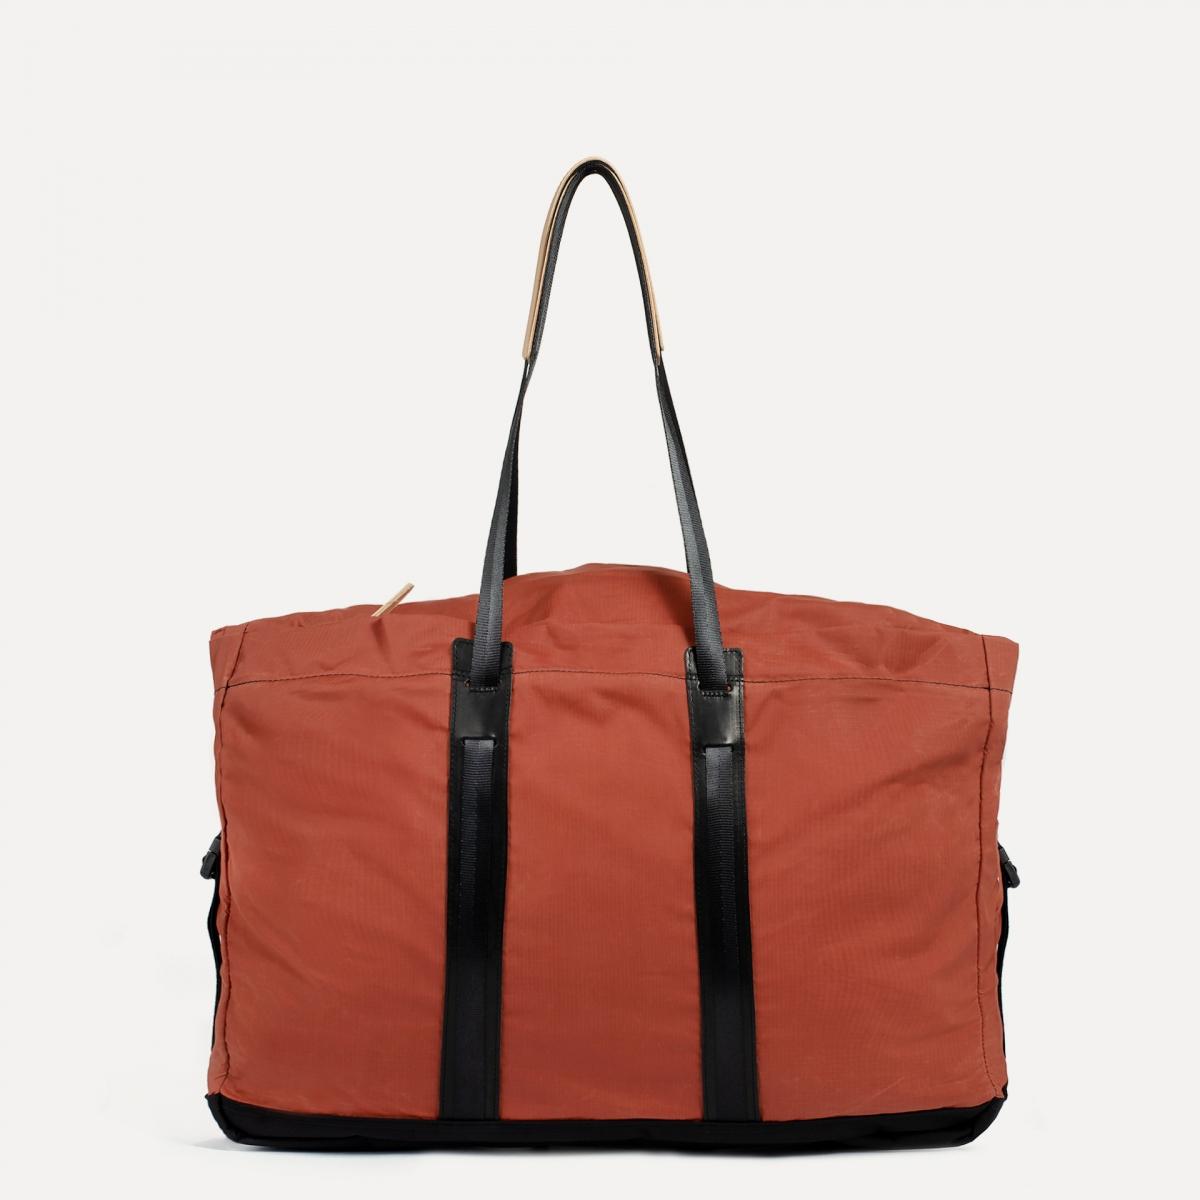 35L Baroud Travel bag - Burgundy (image n°3)